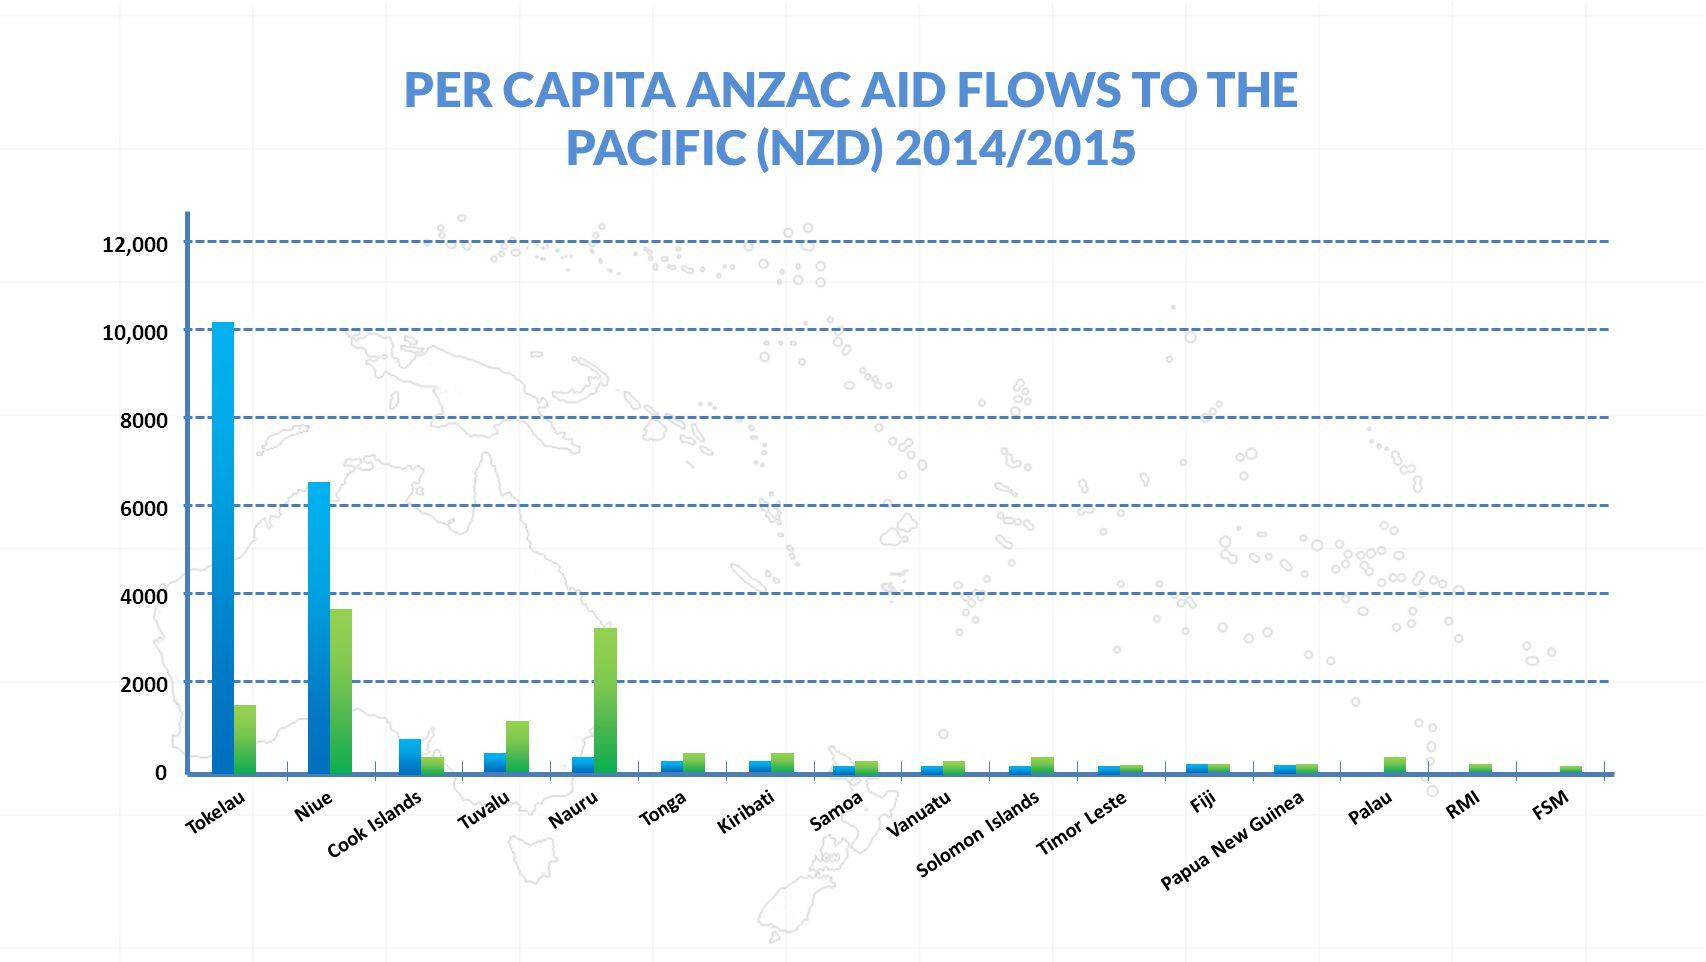 PER CAPITA ANZAC AID FLOWS TO THE PACIFIC (NZD) 2014/2015 TokelauNiueCook IslandsTuvaluNauruTongaKiribatiSamoaVanuatuSolomon IslandsTimor LesteFijiPapua New GuineaPalauRMIFSM 0 10,000 8000 6000 4000 2000 12,000